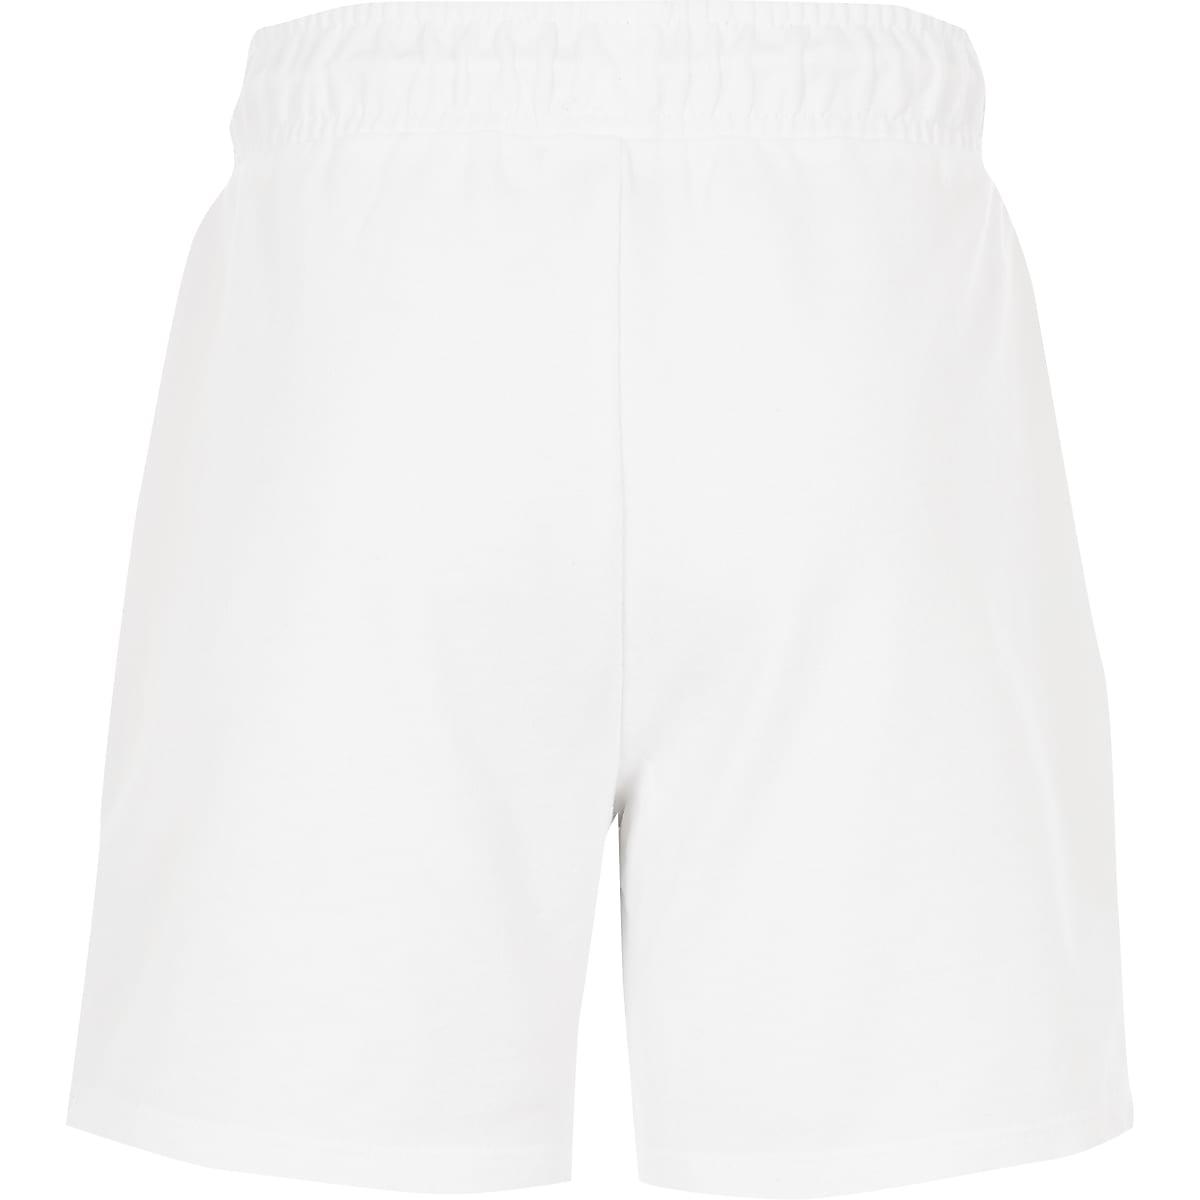 df7f5a197c4e Boys pink block 'Prolific' jersey shorts - Jersey Shorts - Shorts - boys